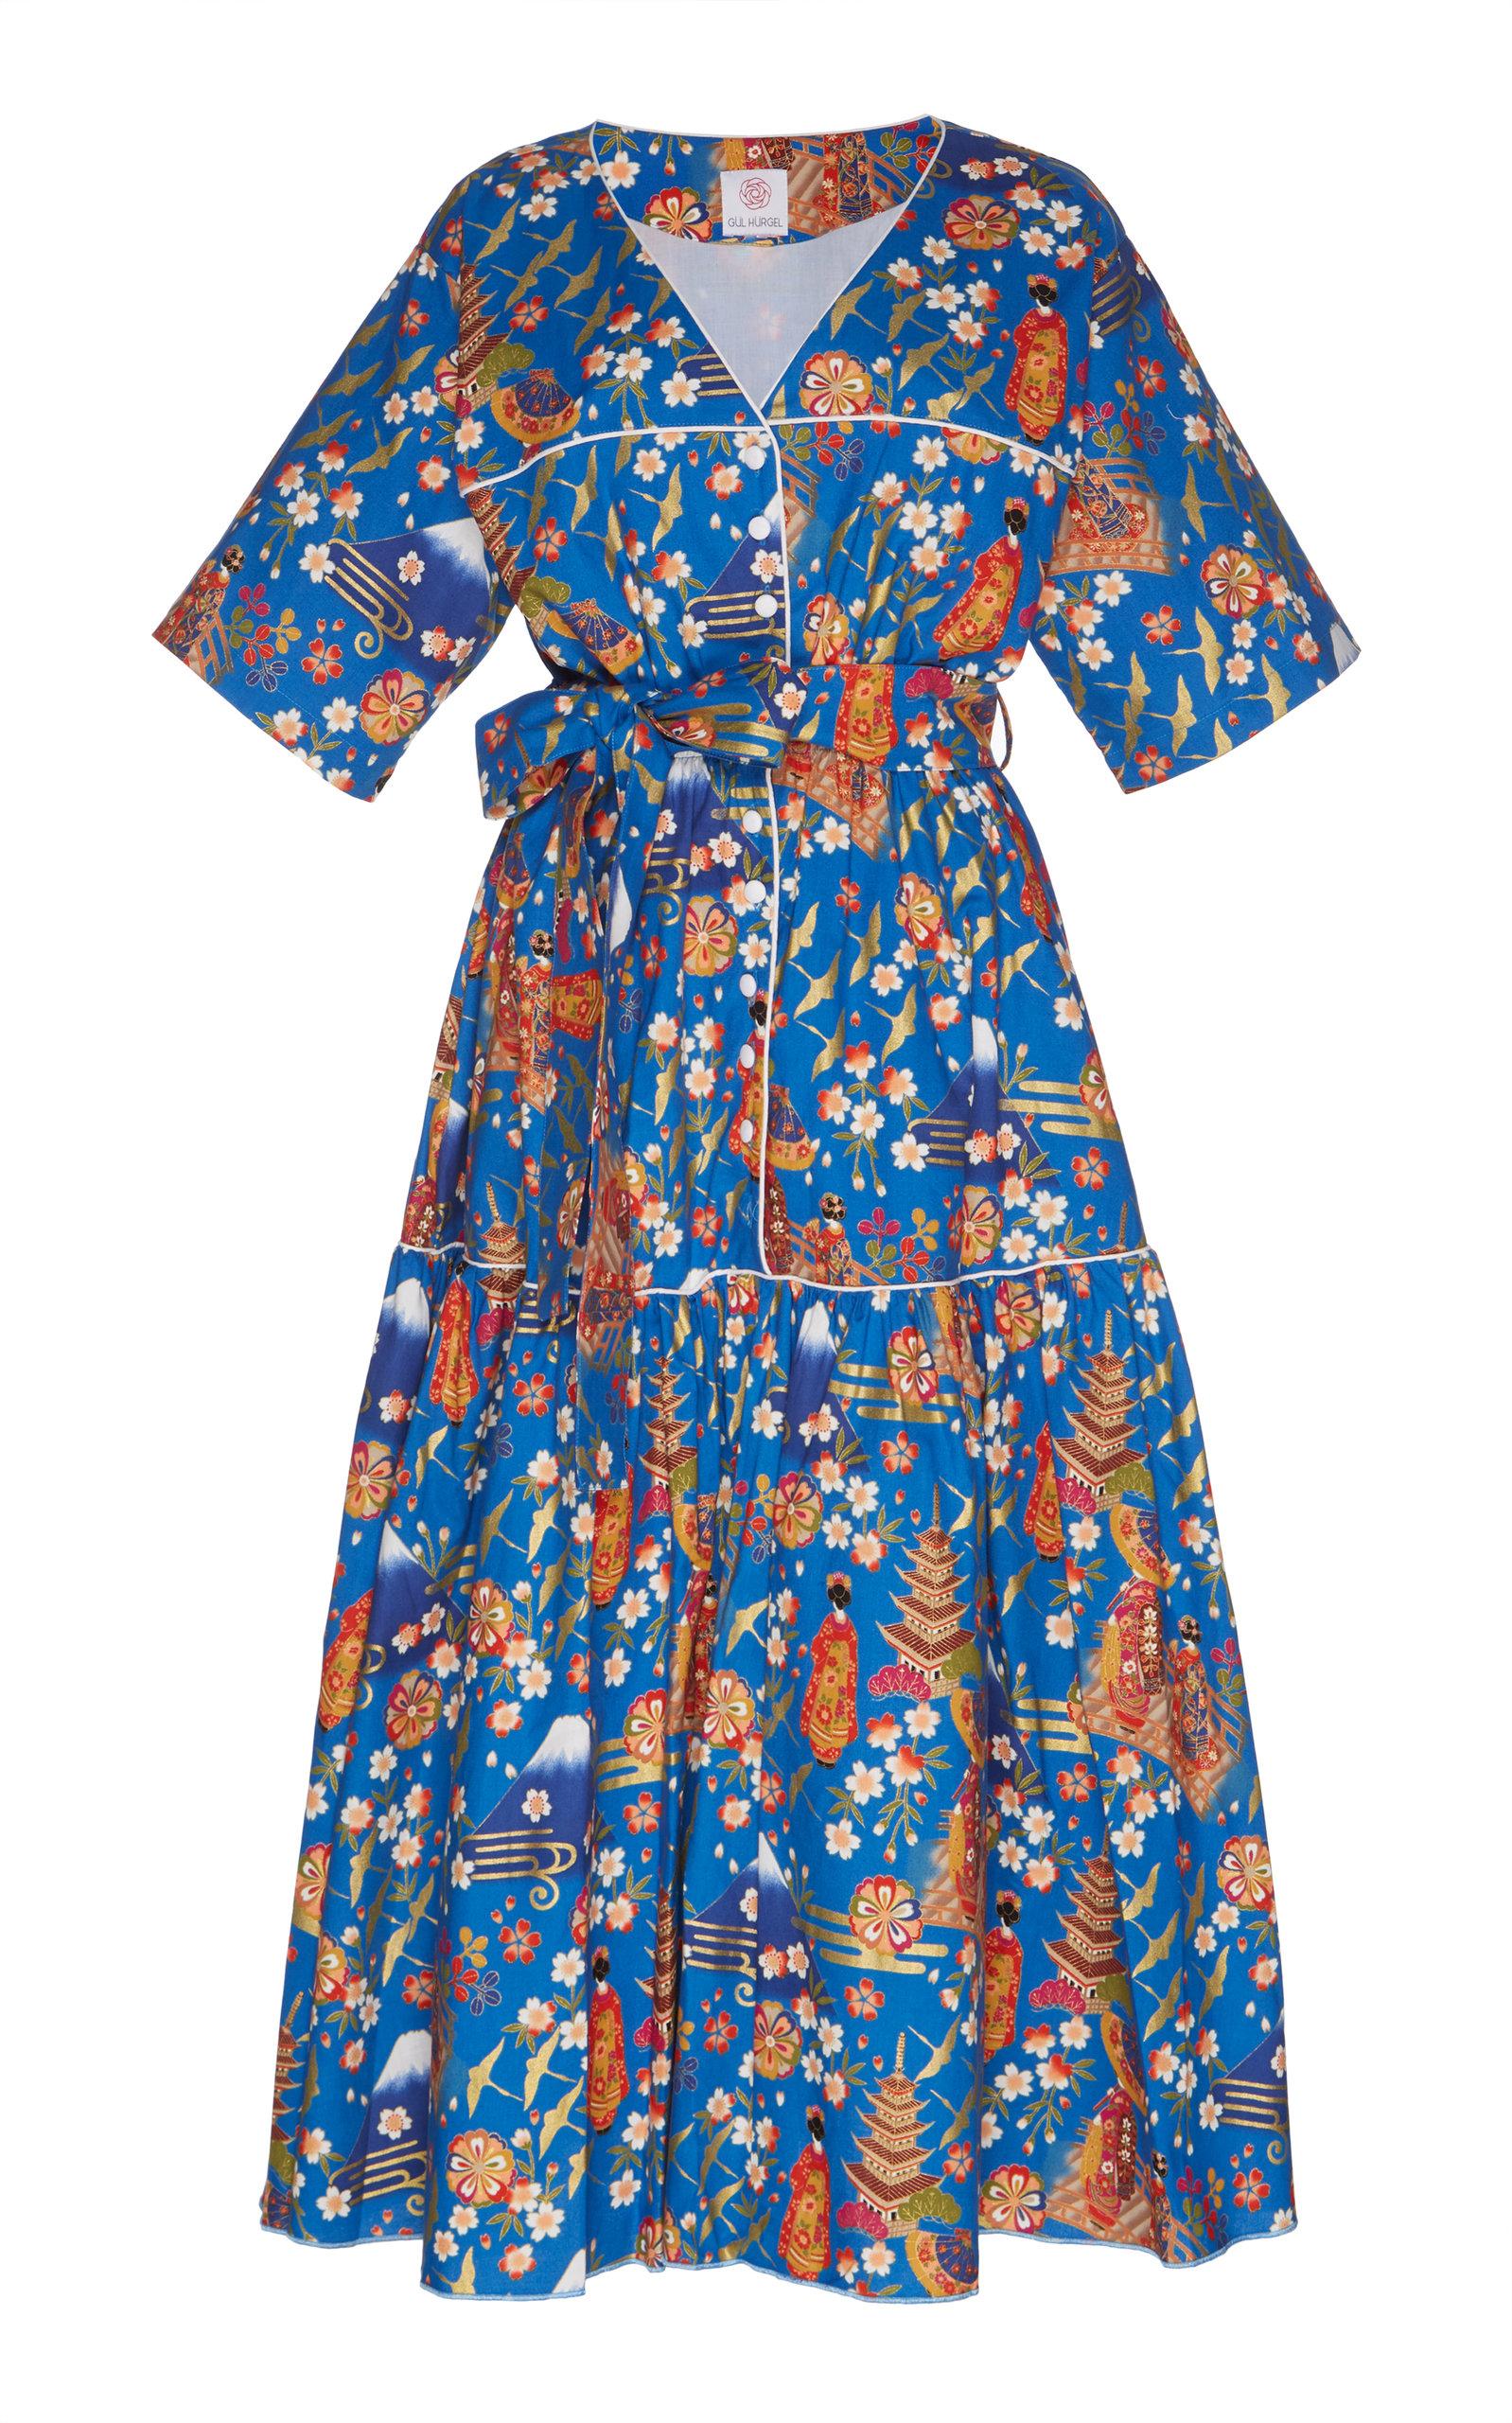 GÜL HÜRGEL Belted Midi Dress in Floral